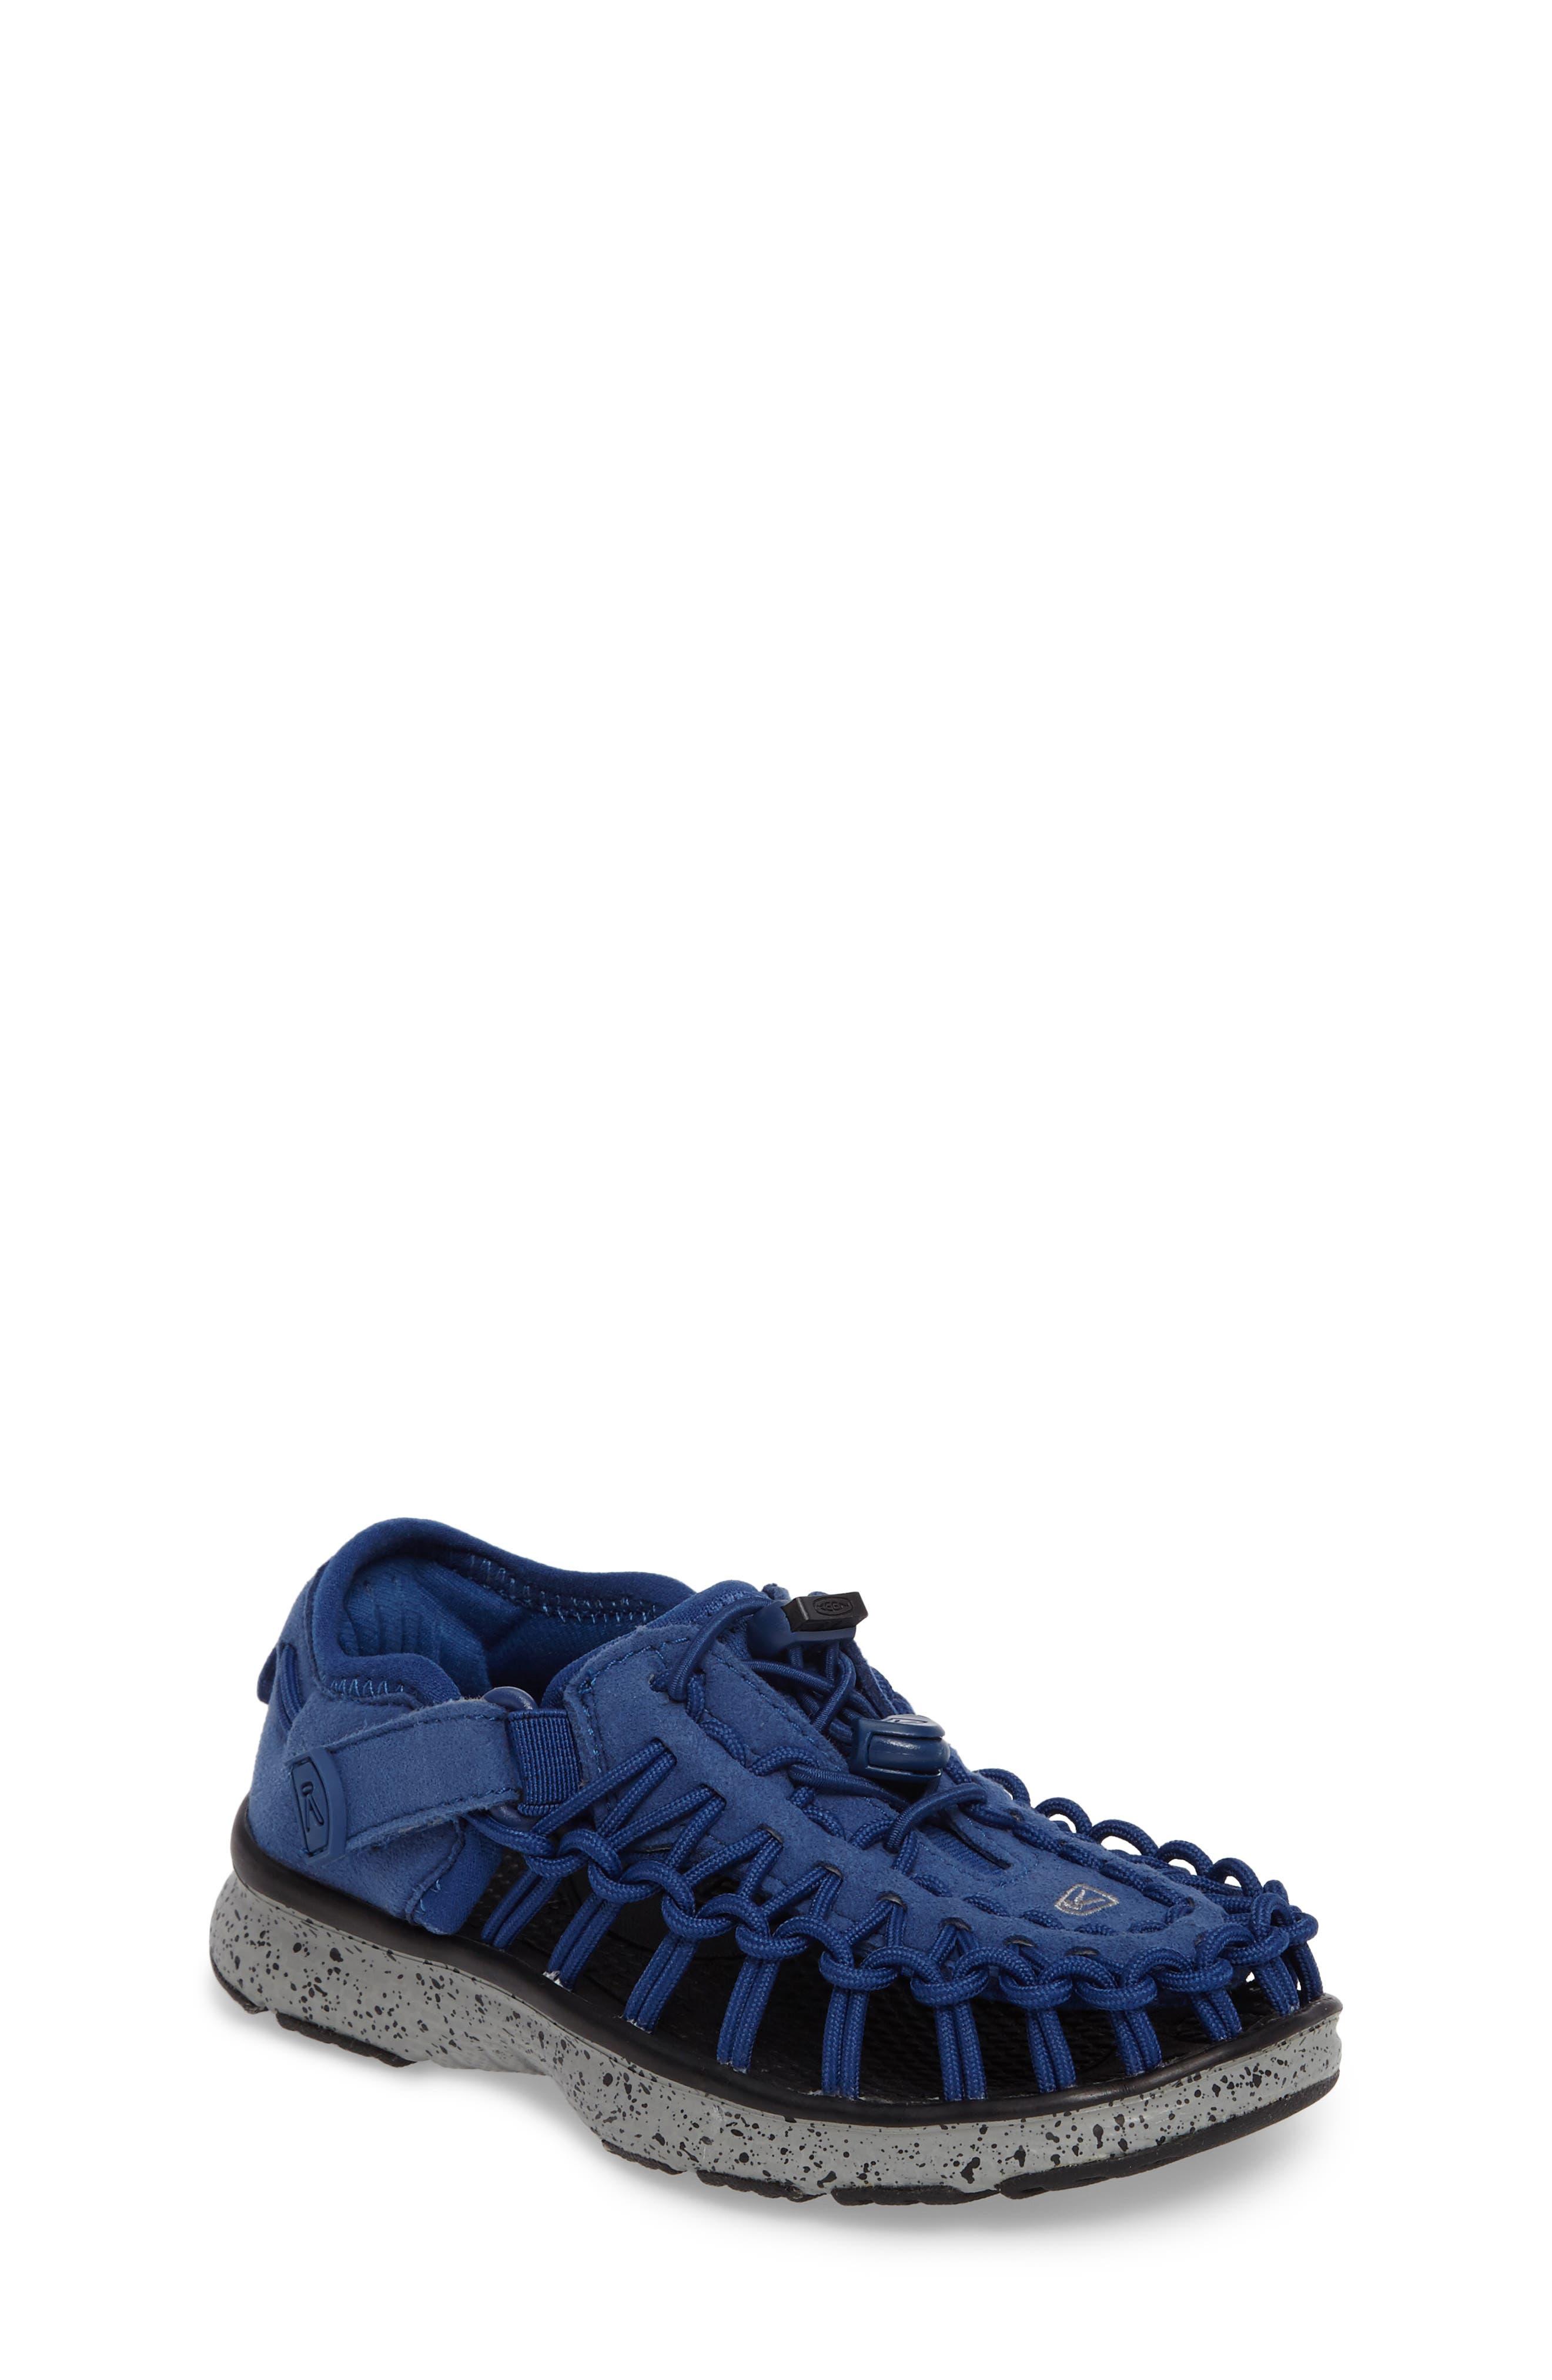 'Uneek' Water Sneaker,                         Main,                         color, Blue/ Neutral Grey